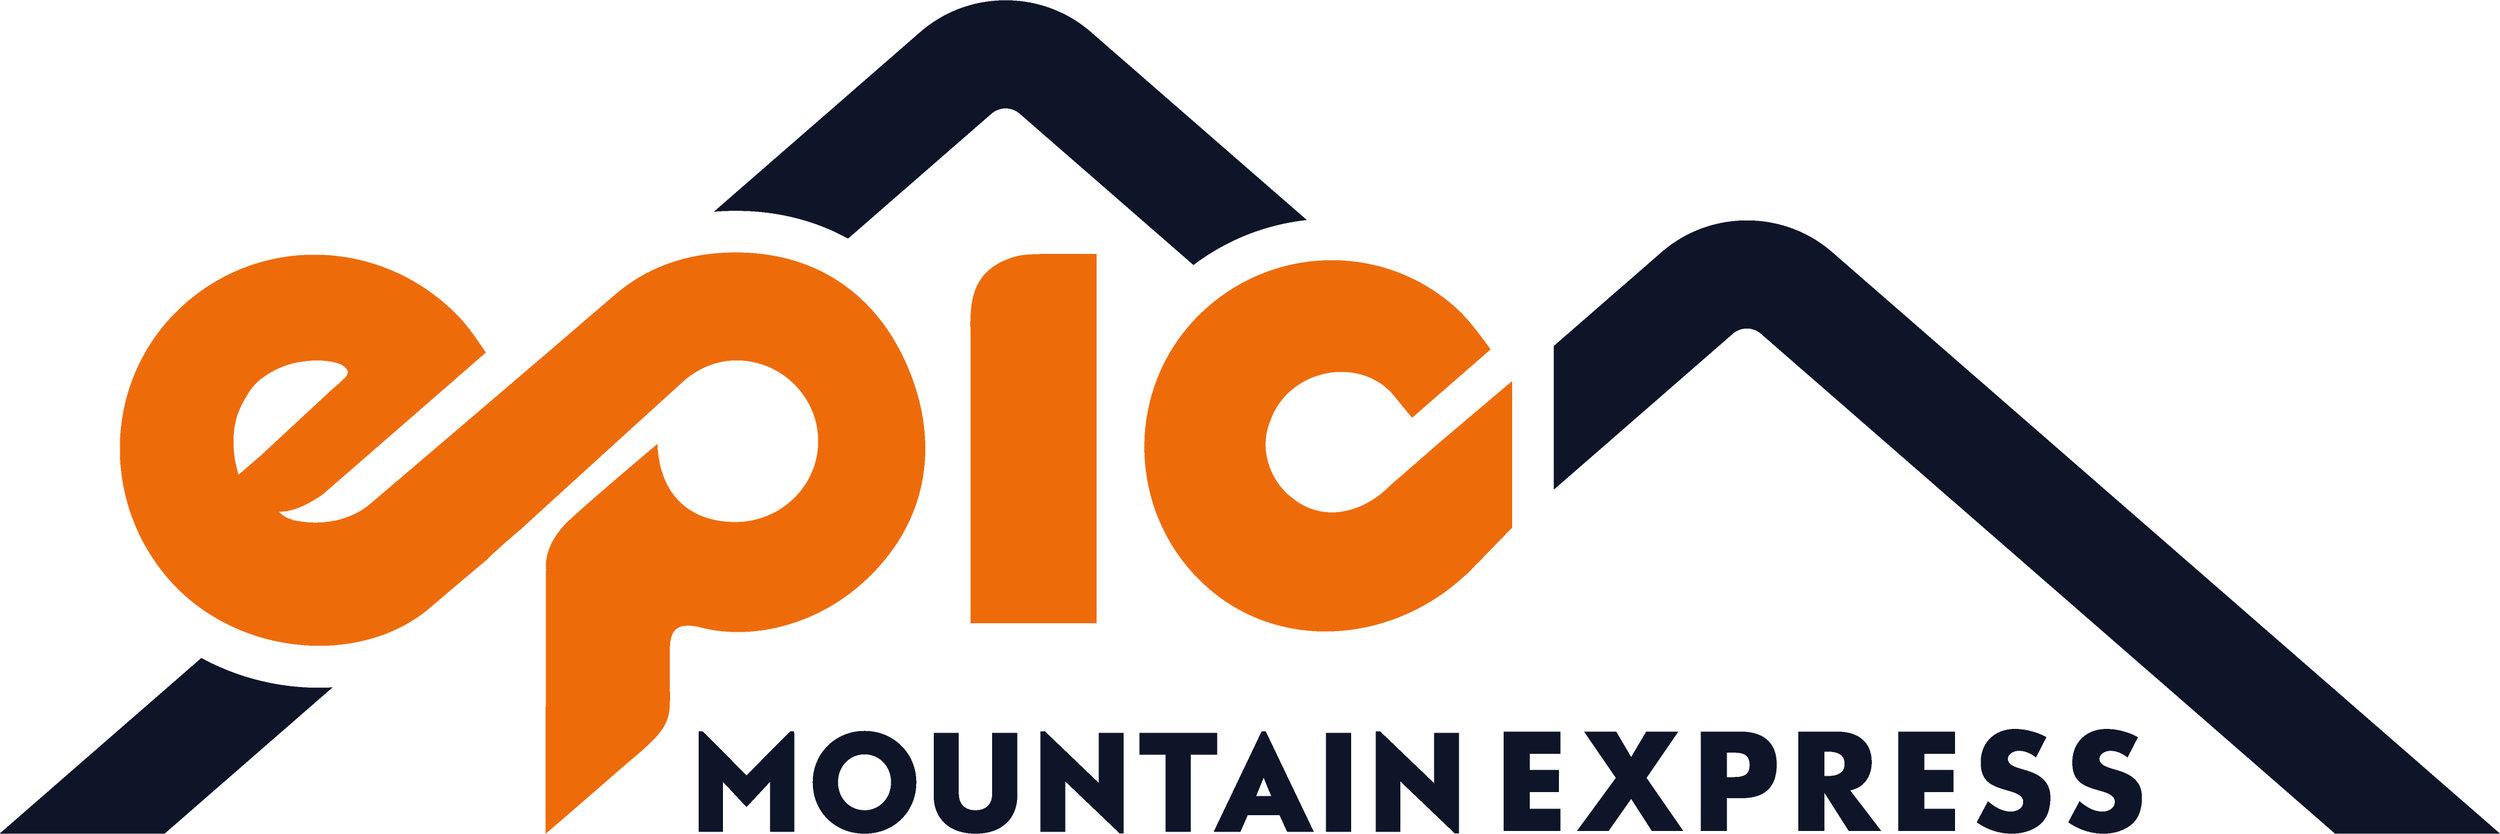 EPIC Mountain Express Logo_Web.jpg